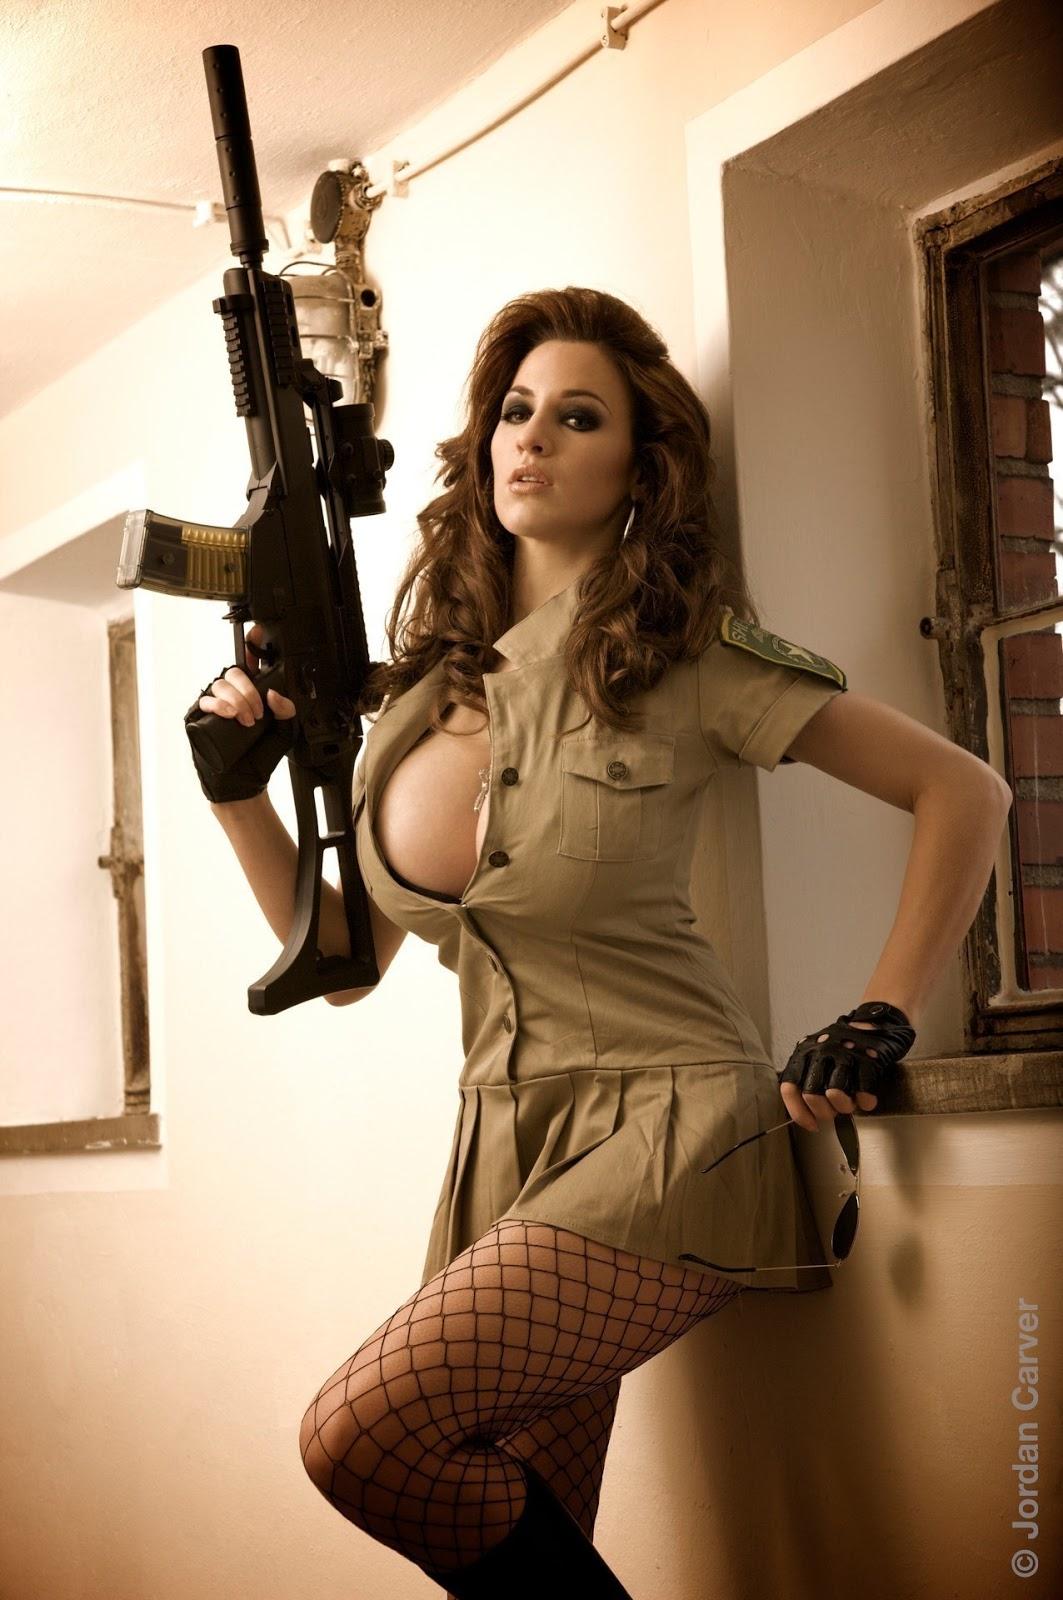 Hot Jordan Carver Sheriff Sexy Photo Shoot Hd  Damn Sexy-9655